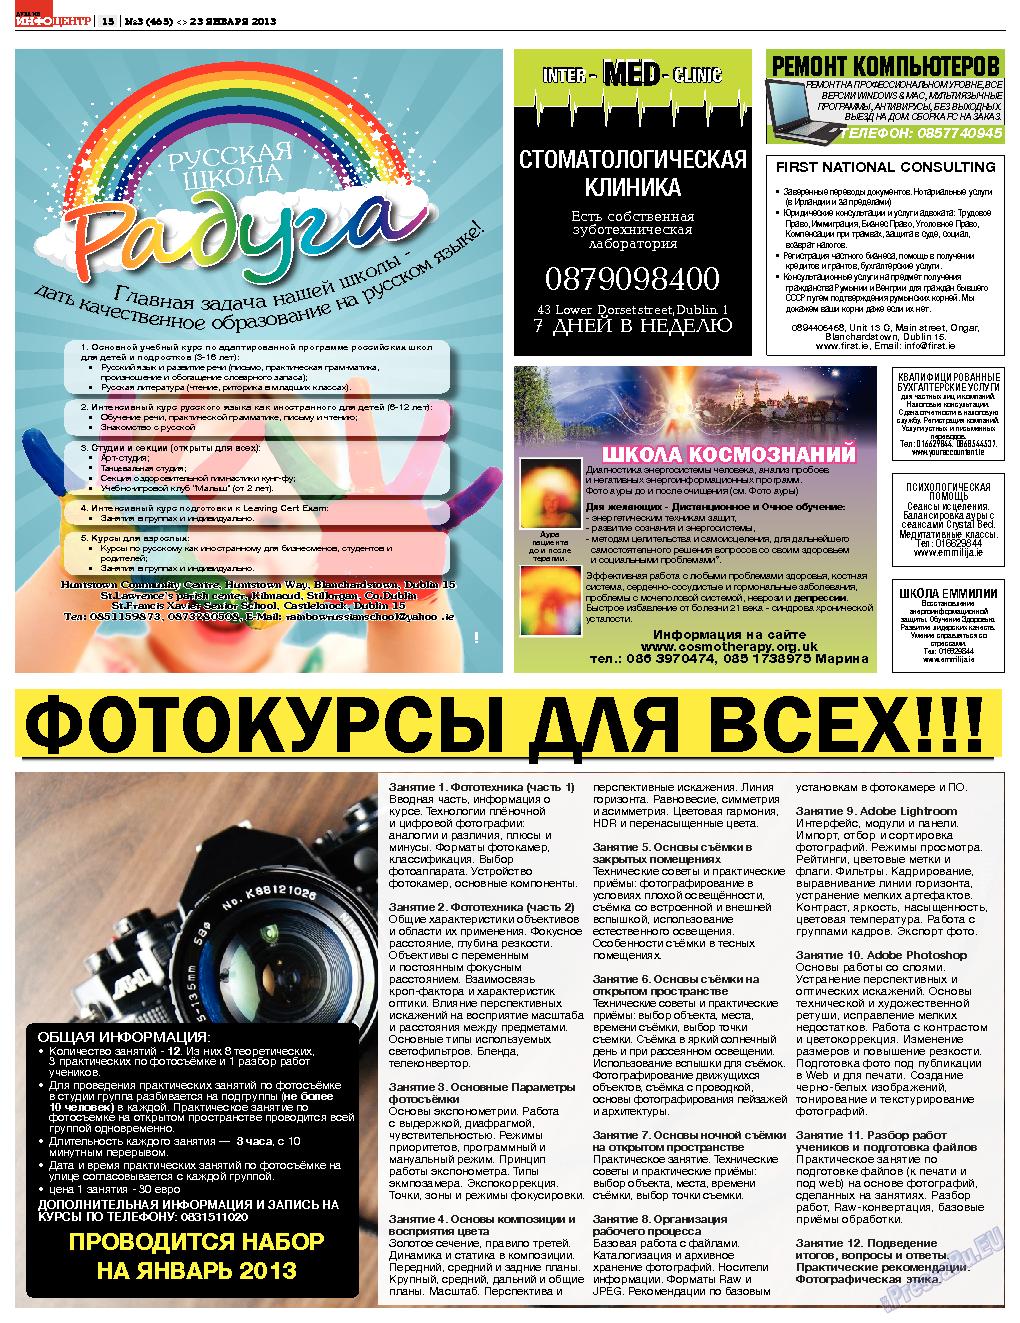 Дублин инфоцентр (газета). 2013 год, номер 3, стр. 15